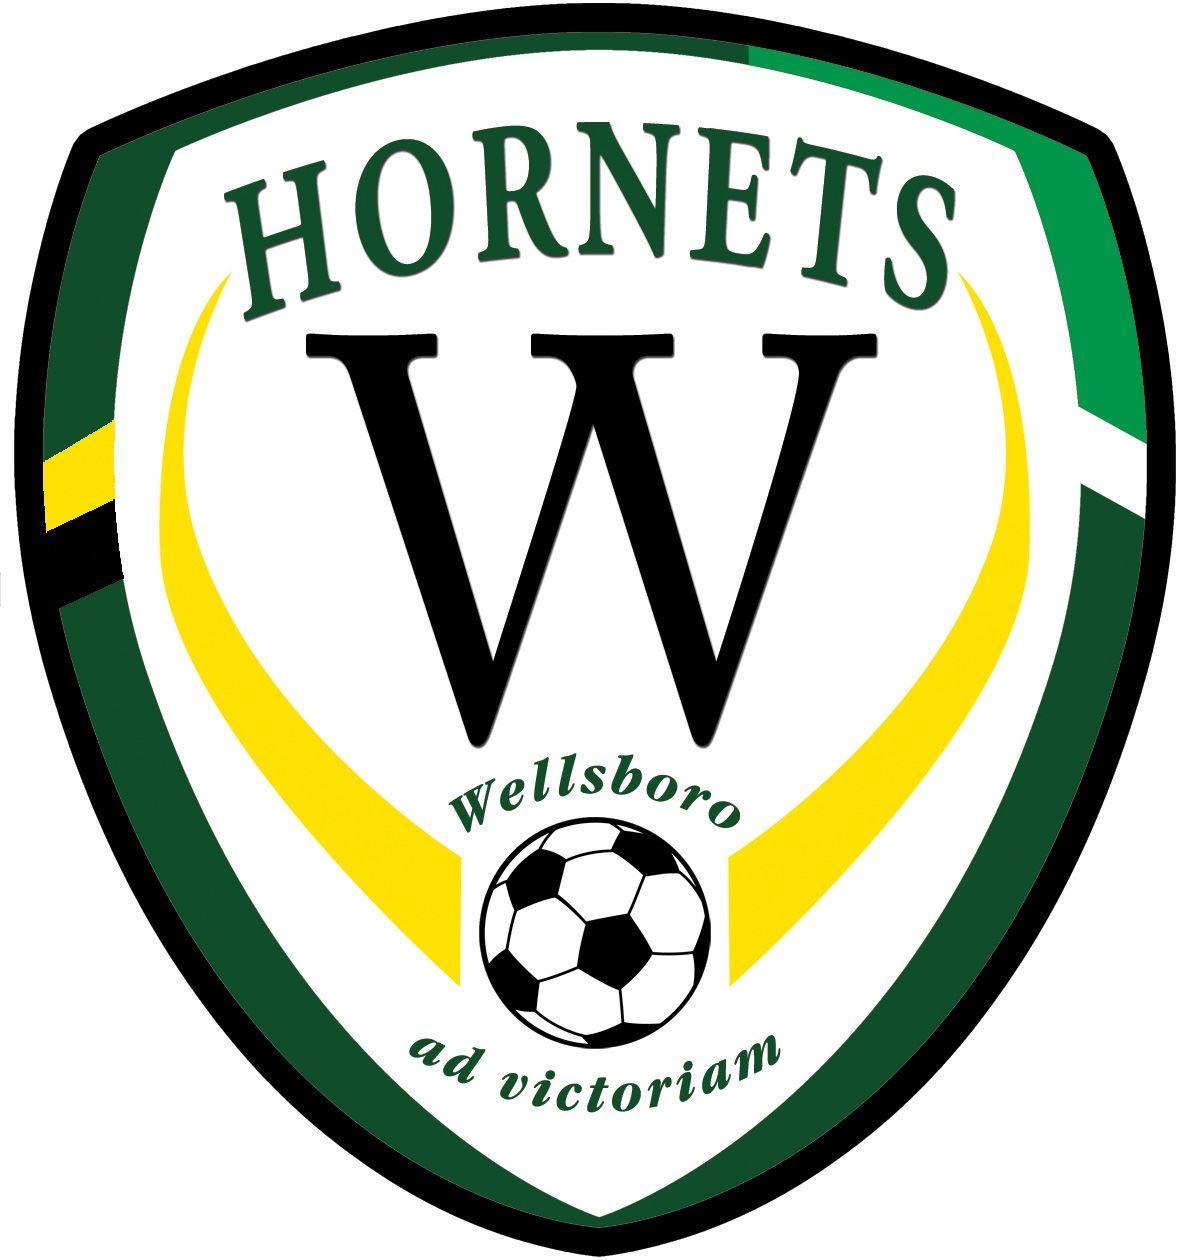 Wellsboro High School - Hornets